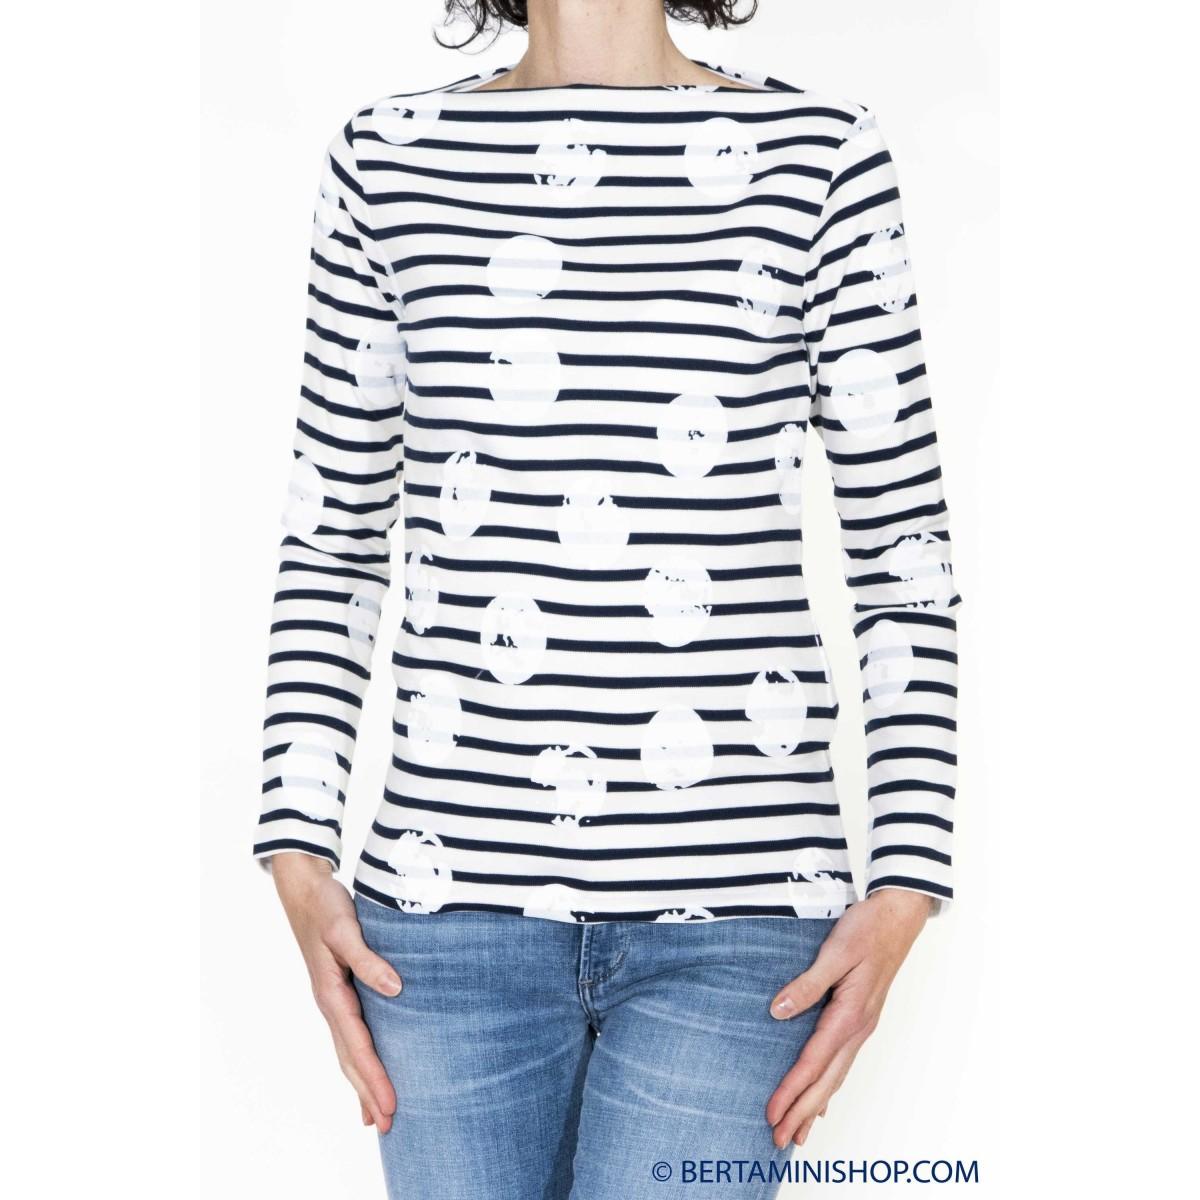 T-shirt donna Erika cavallini - semicouture - 110 t-shirt manica lunga